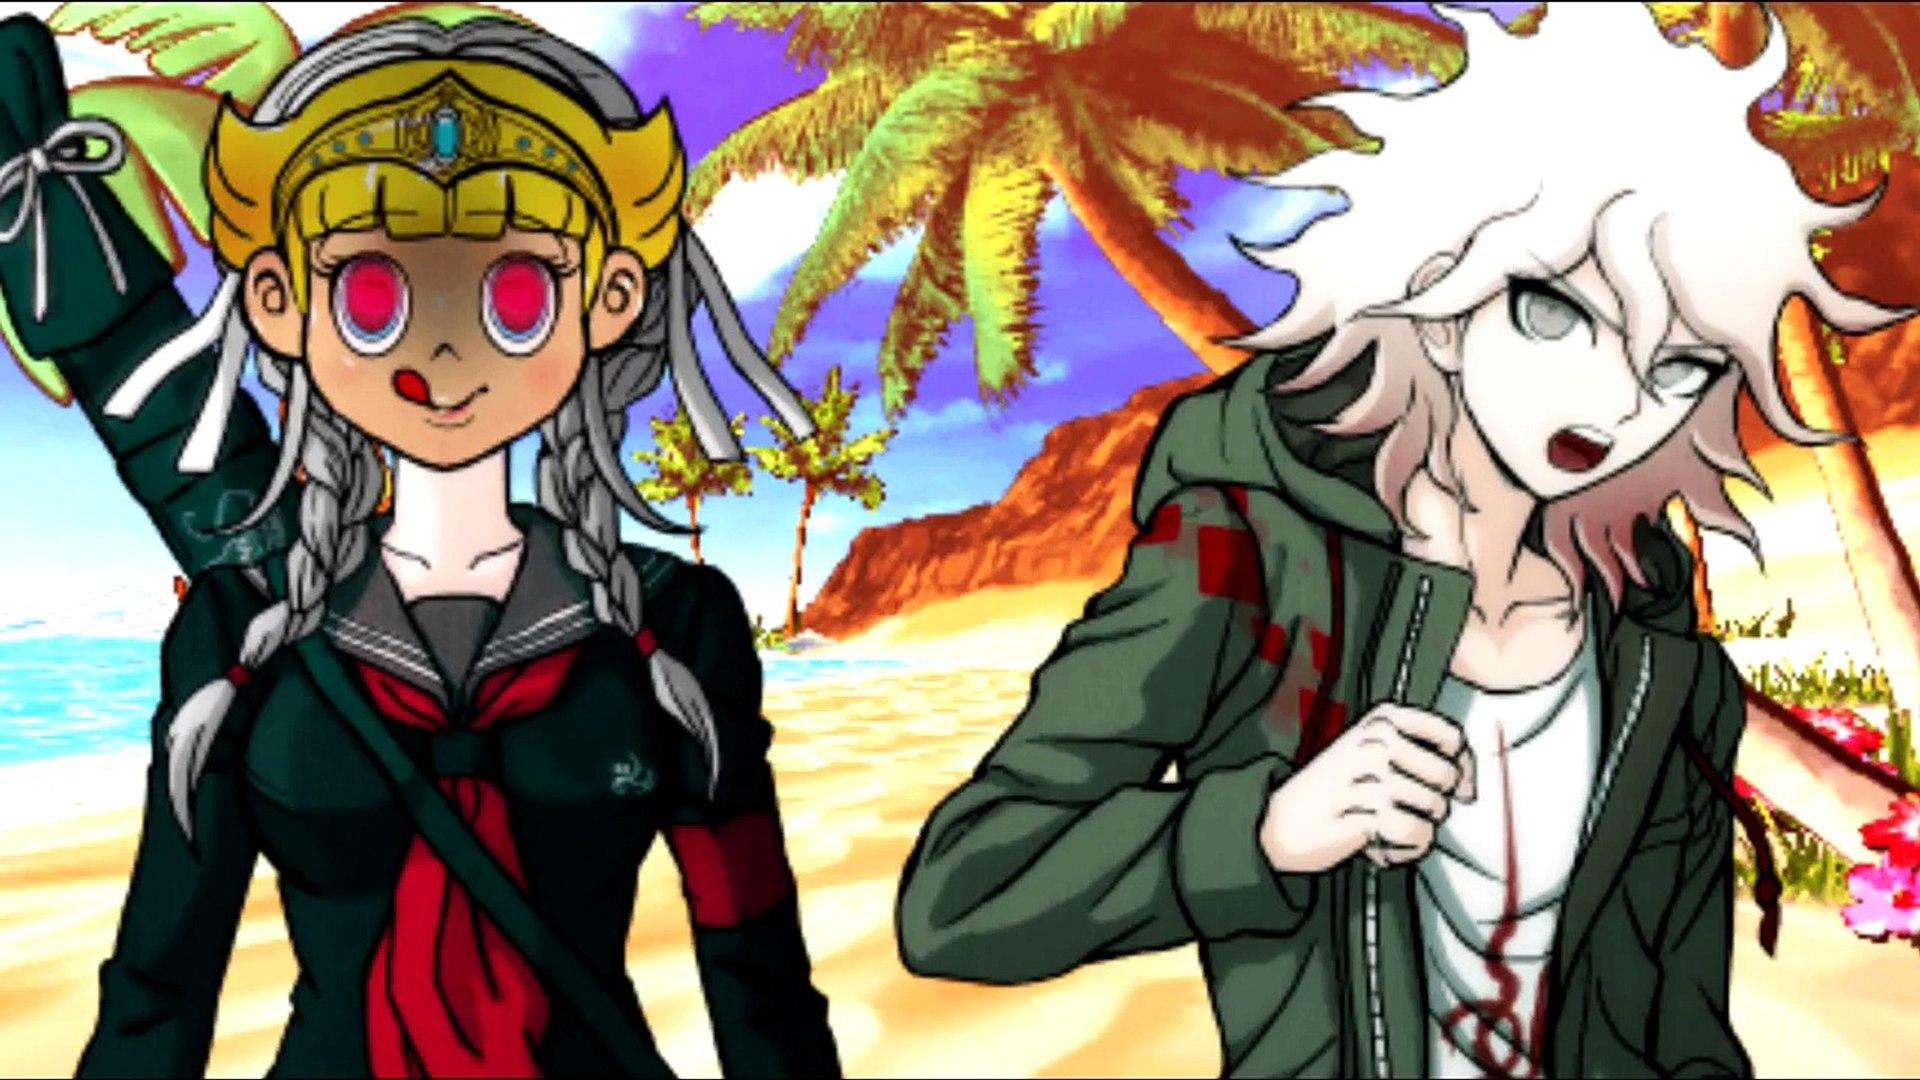 REJECTs' {Anime Parodies that didn't make it}